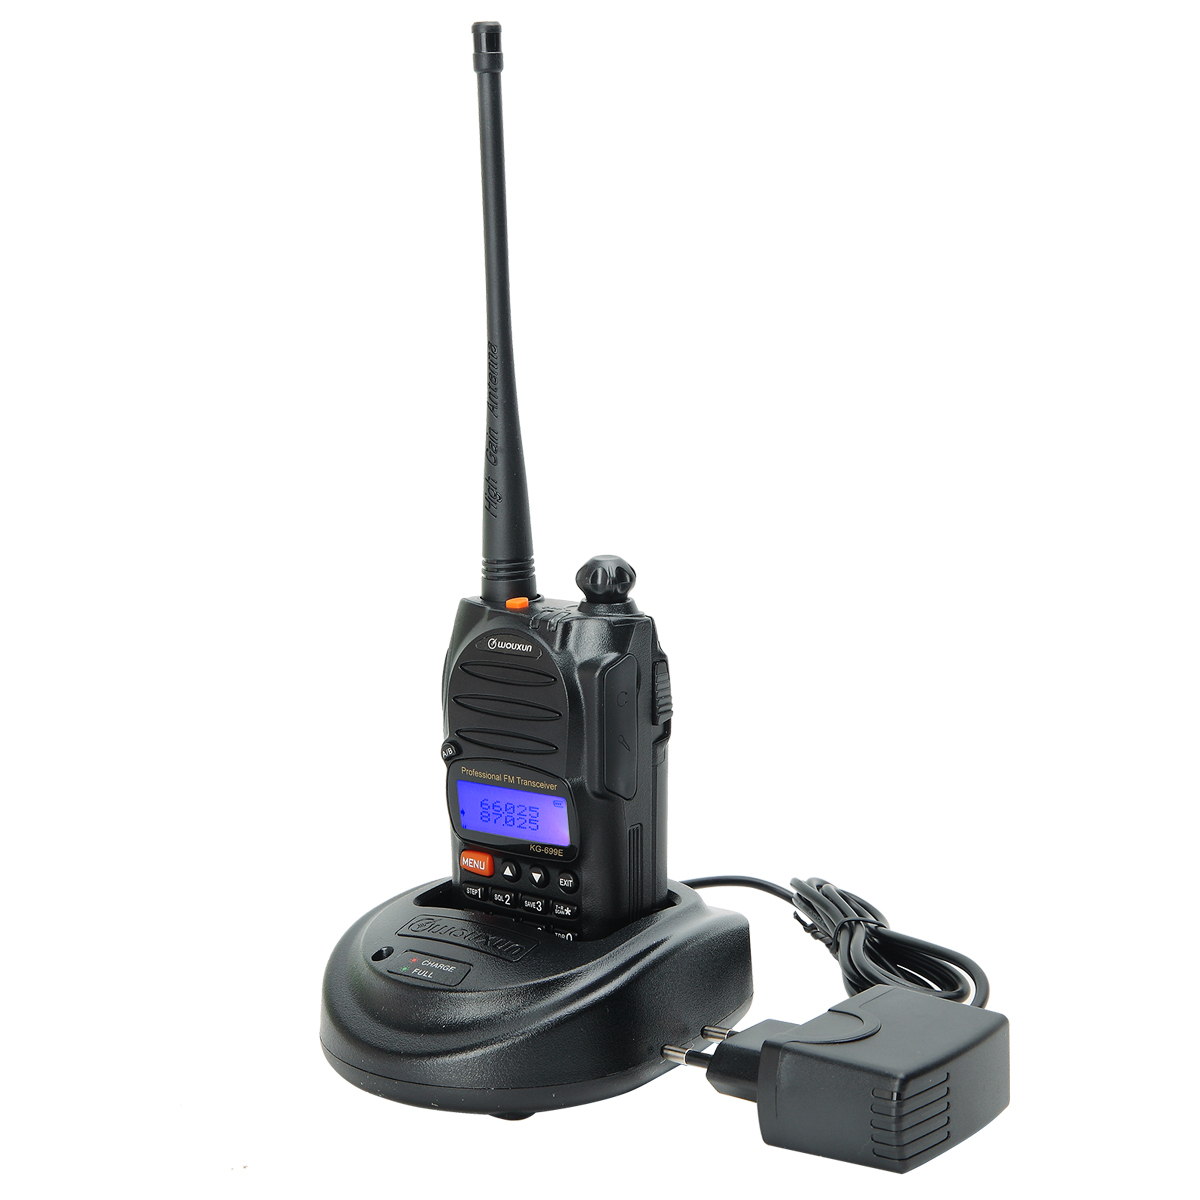 Wouxun KG-699E 66-88MHz DTMF 1750Hz CTCSS/DCS VOX SOS IP55 Waterproof Amateur Ham Handheld Transceiver Radio Walkie Talkie